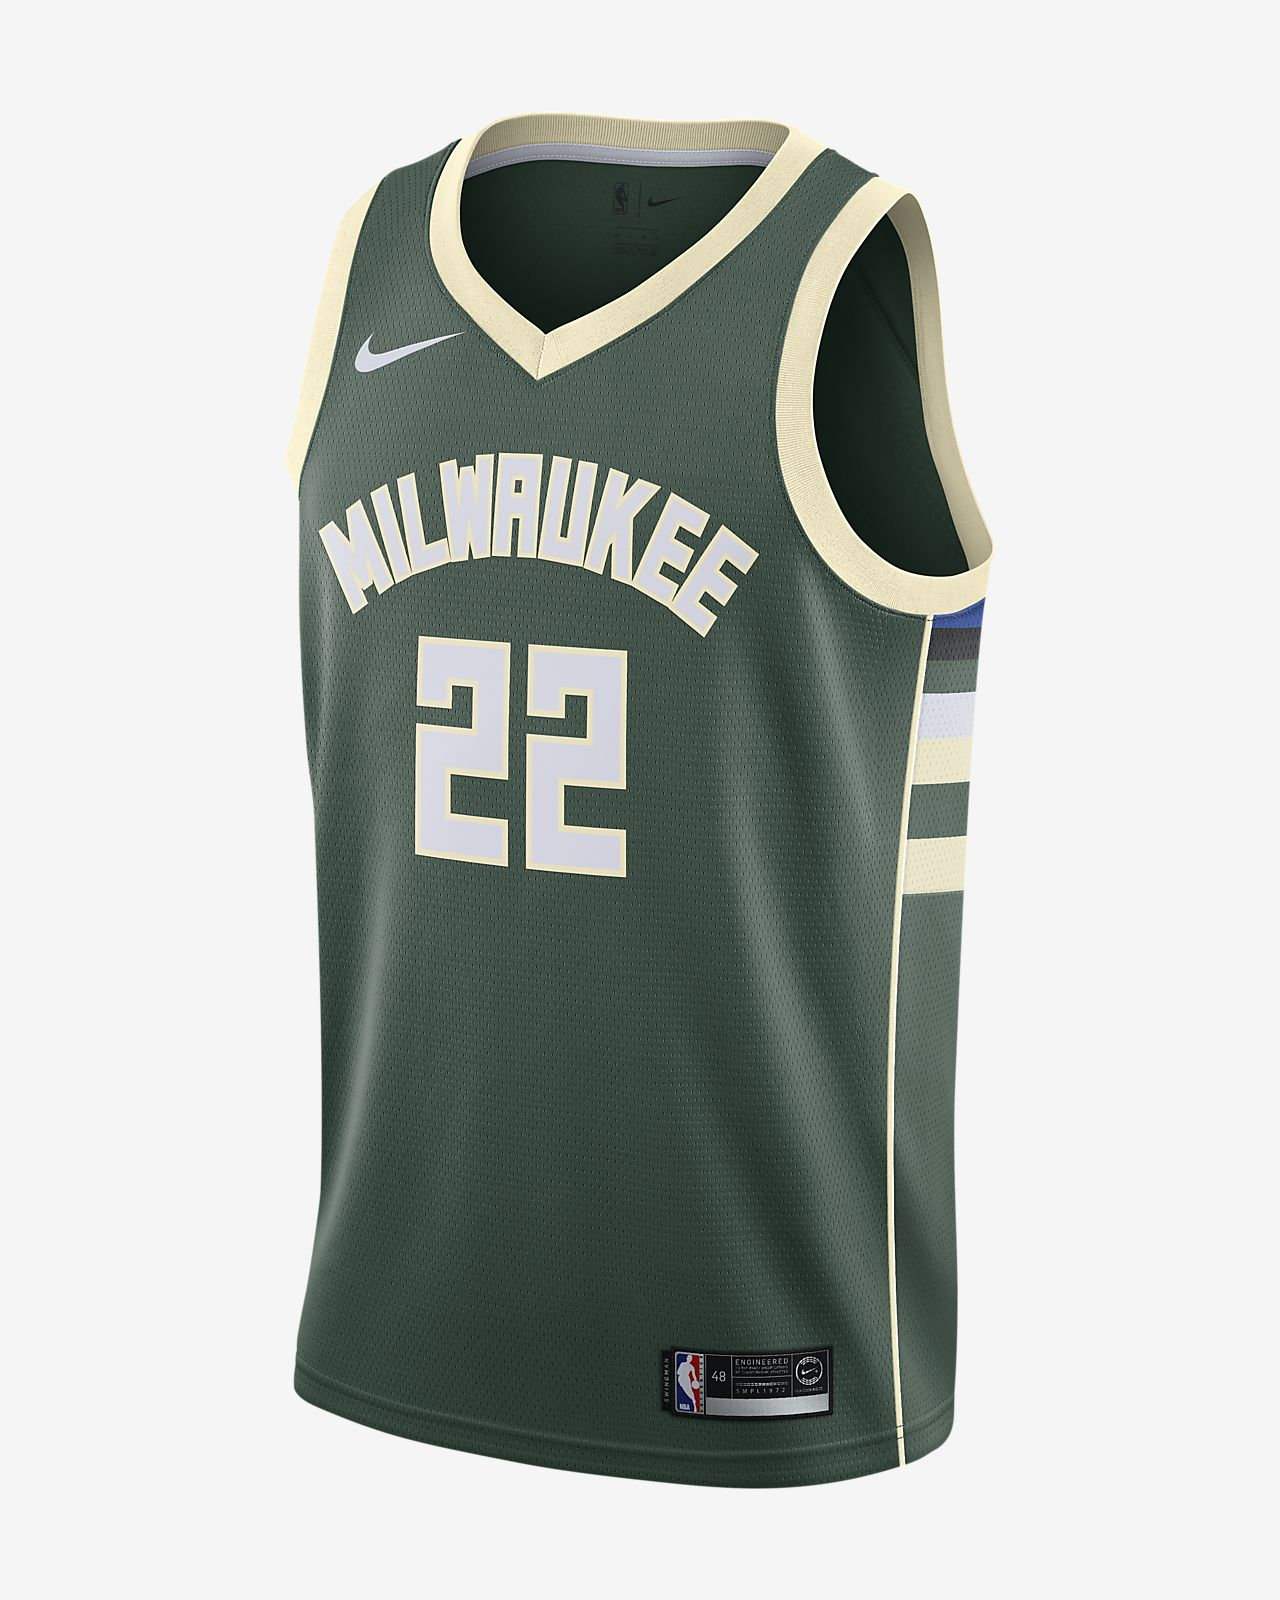 Pánský dres Nike NBA Swingman Connected Khris Middleton Icon Edition(Milwaukee Bucks)